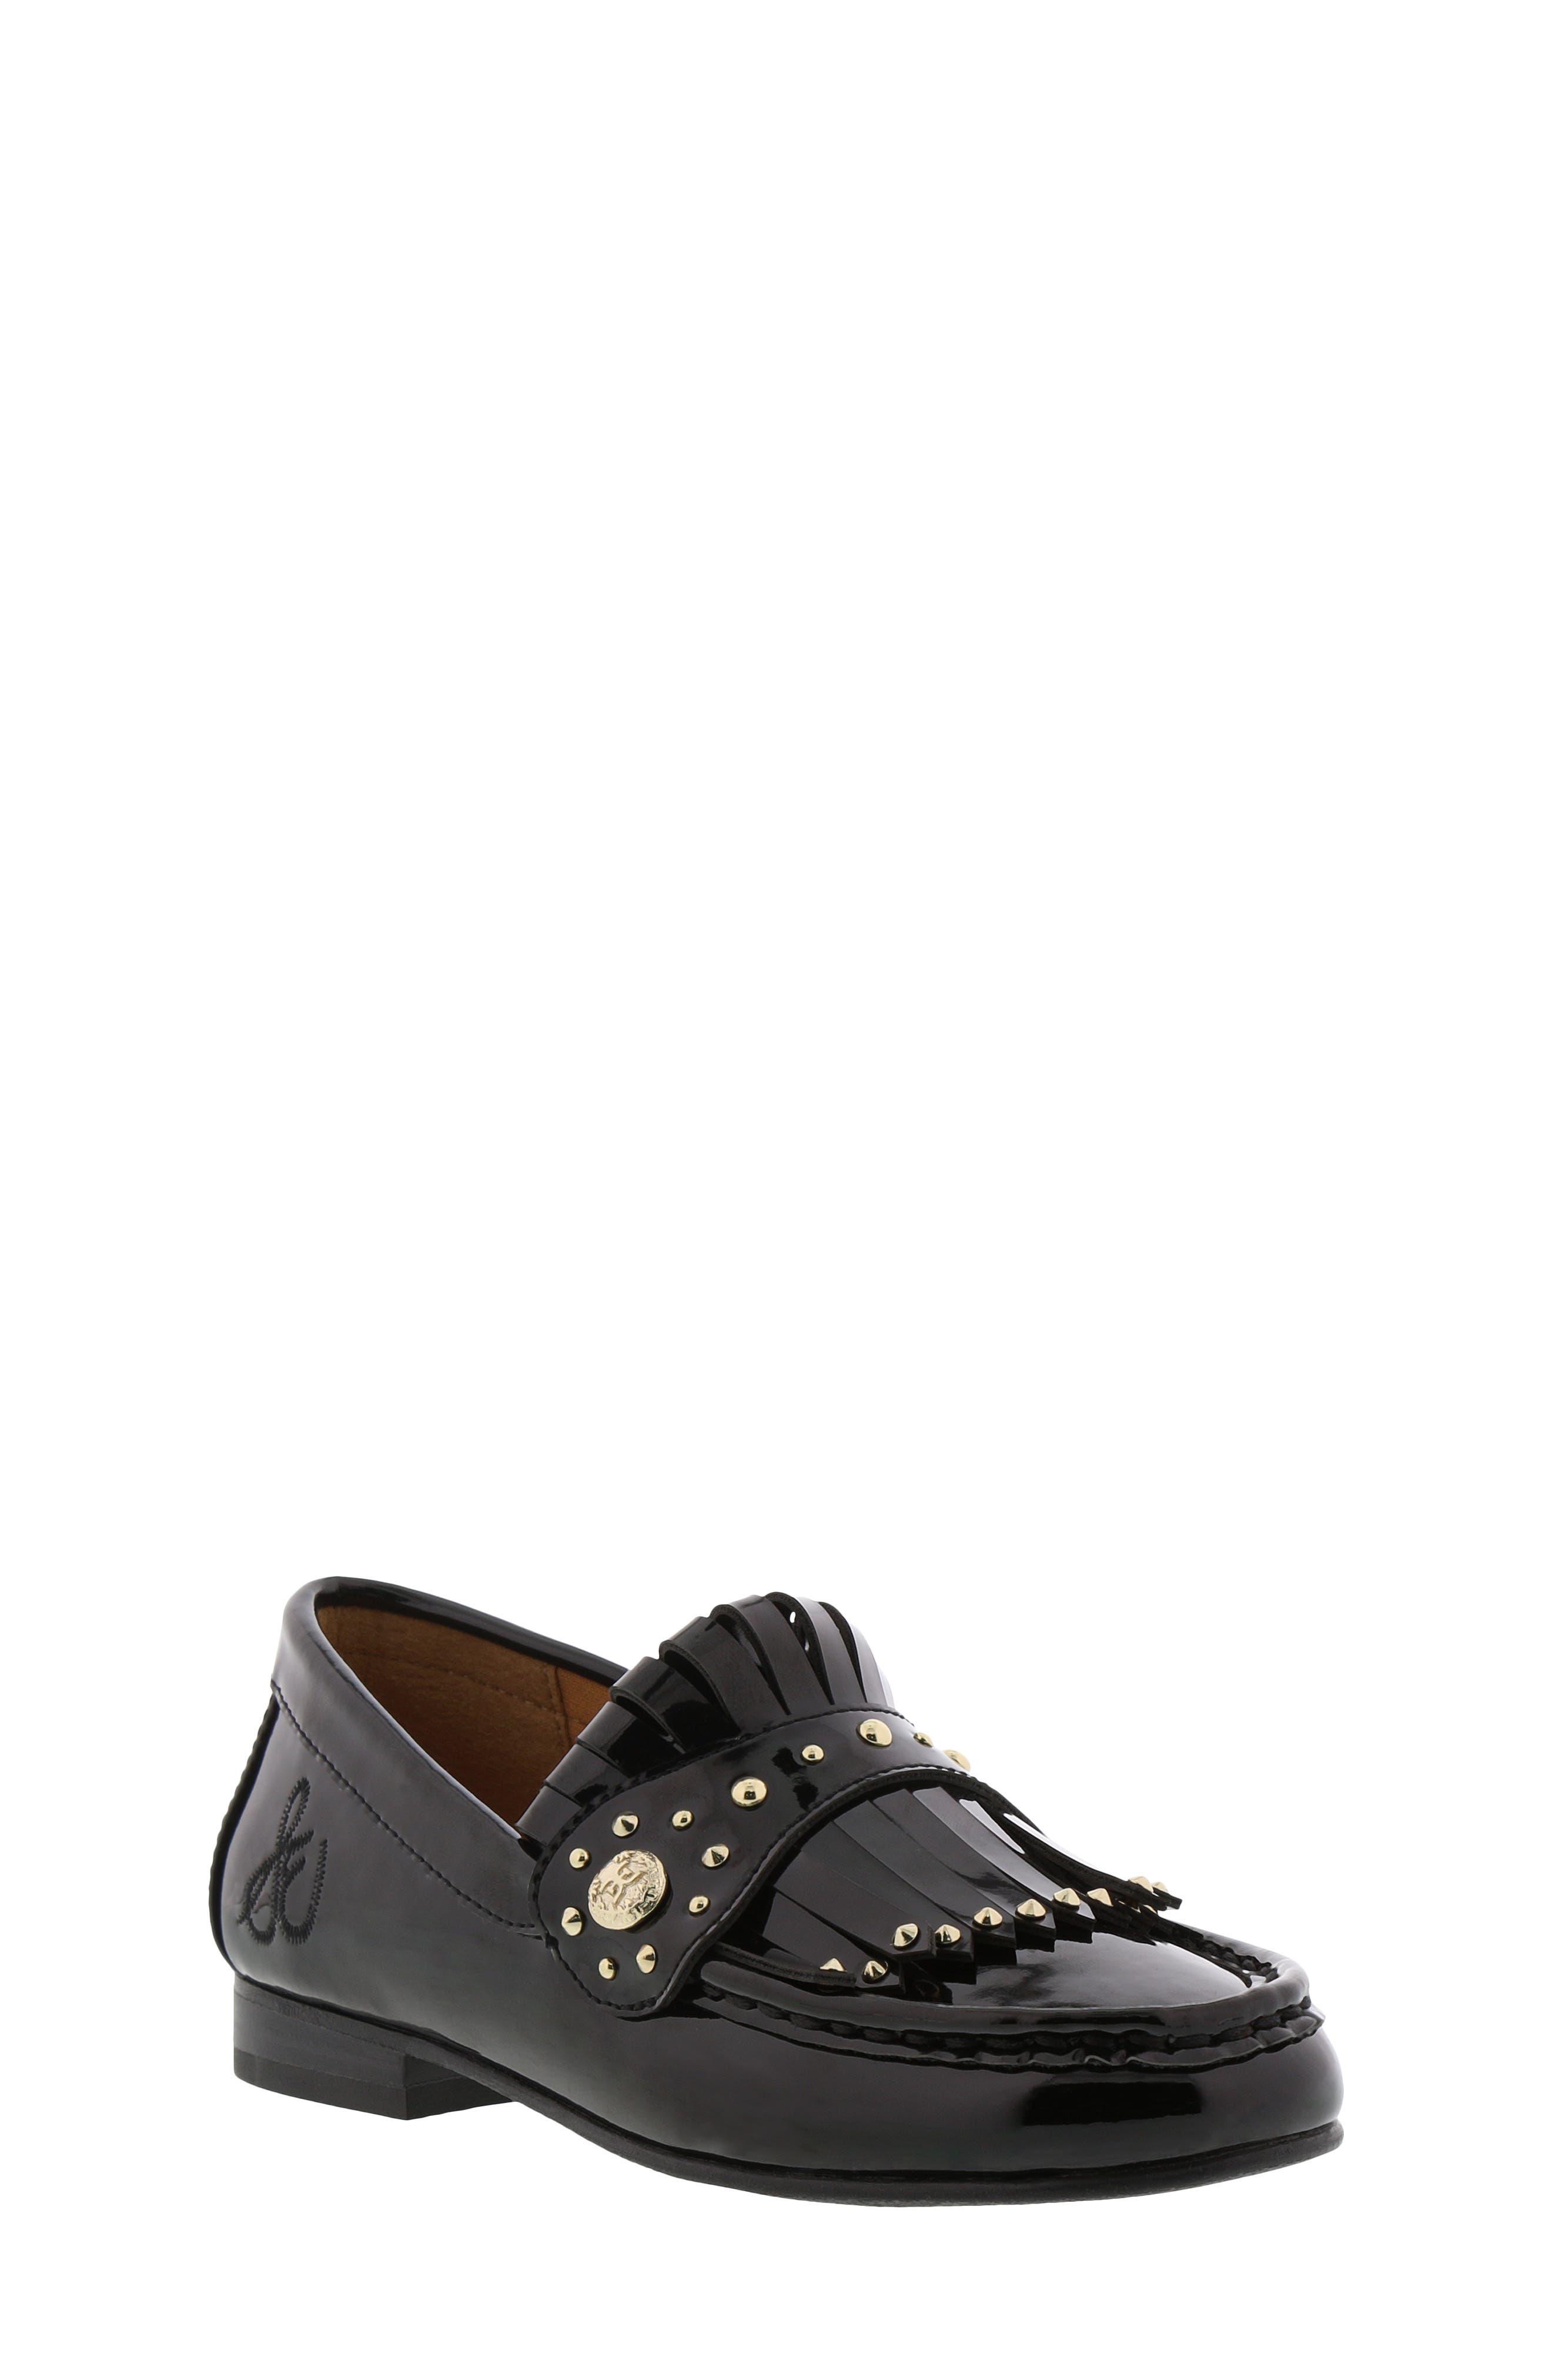 Gabriella Serona Studded Kiltie Loafer,                         Main,                         color, BLACK